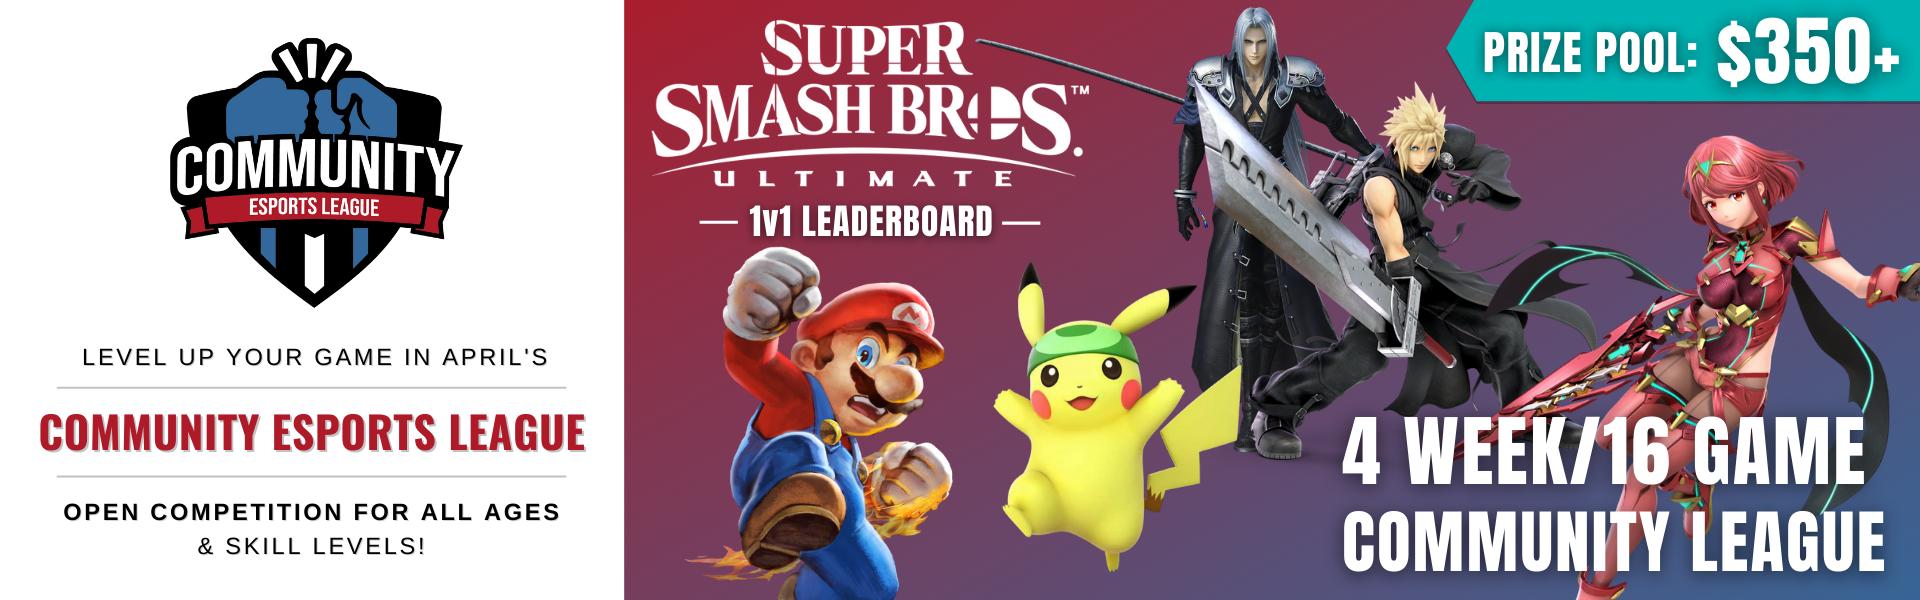 April CEL: Featuring Super Smash Bros. Ultimate